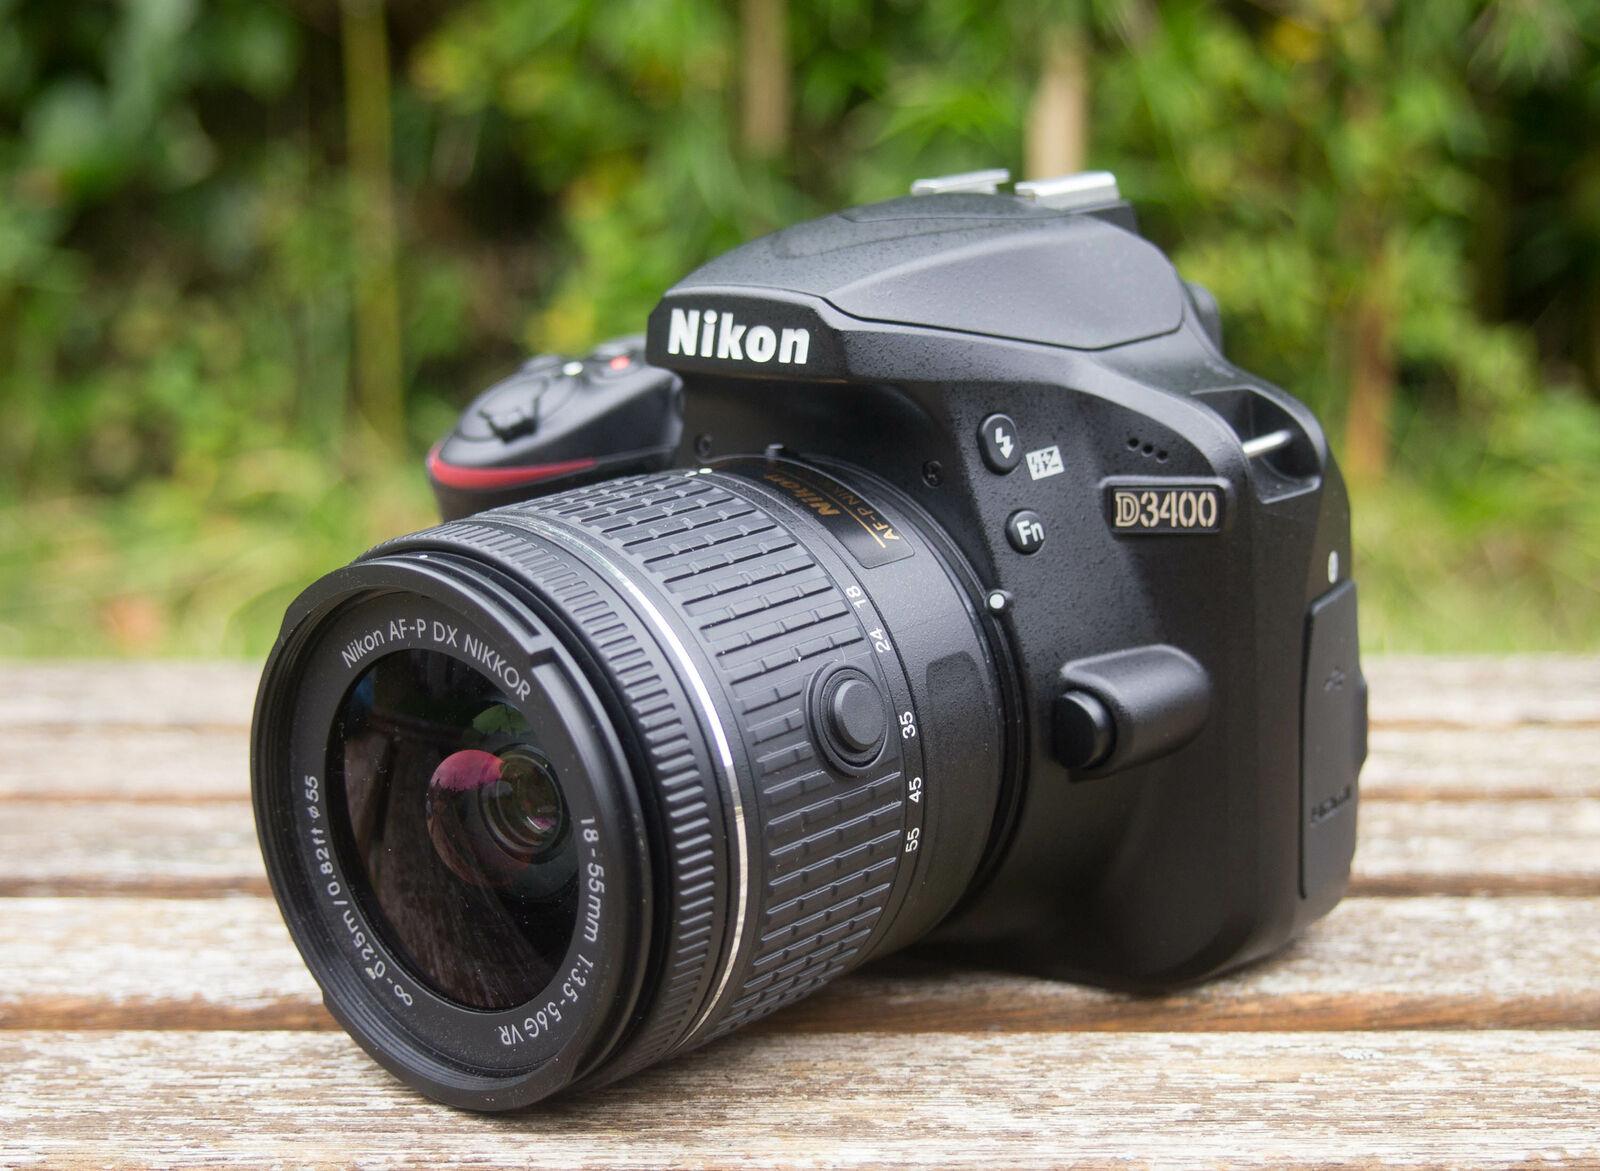 Nikon D3400 24.2MP Digital SLR...